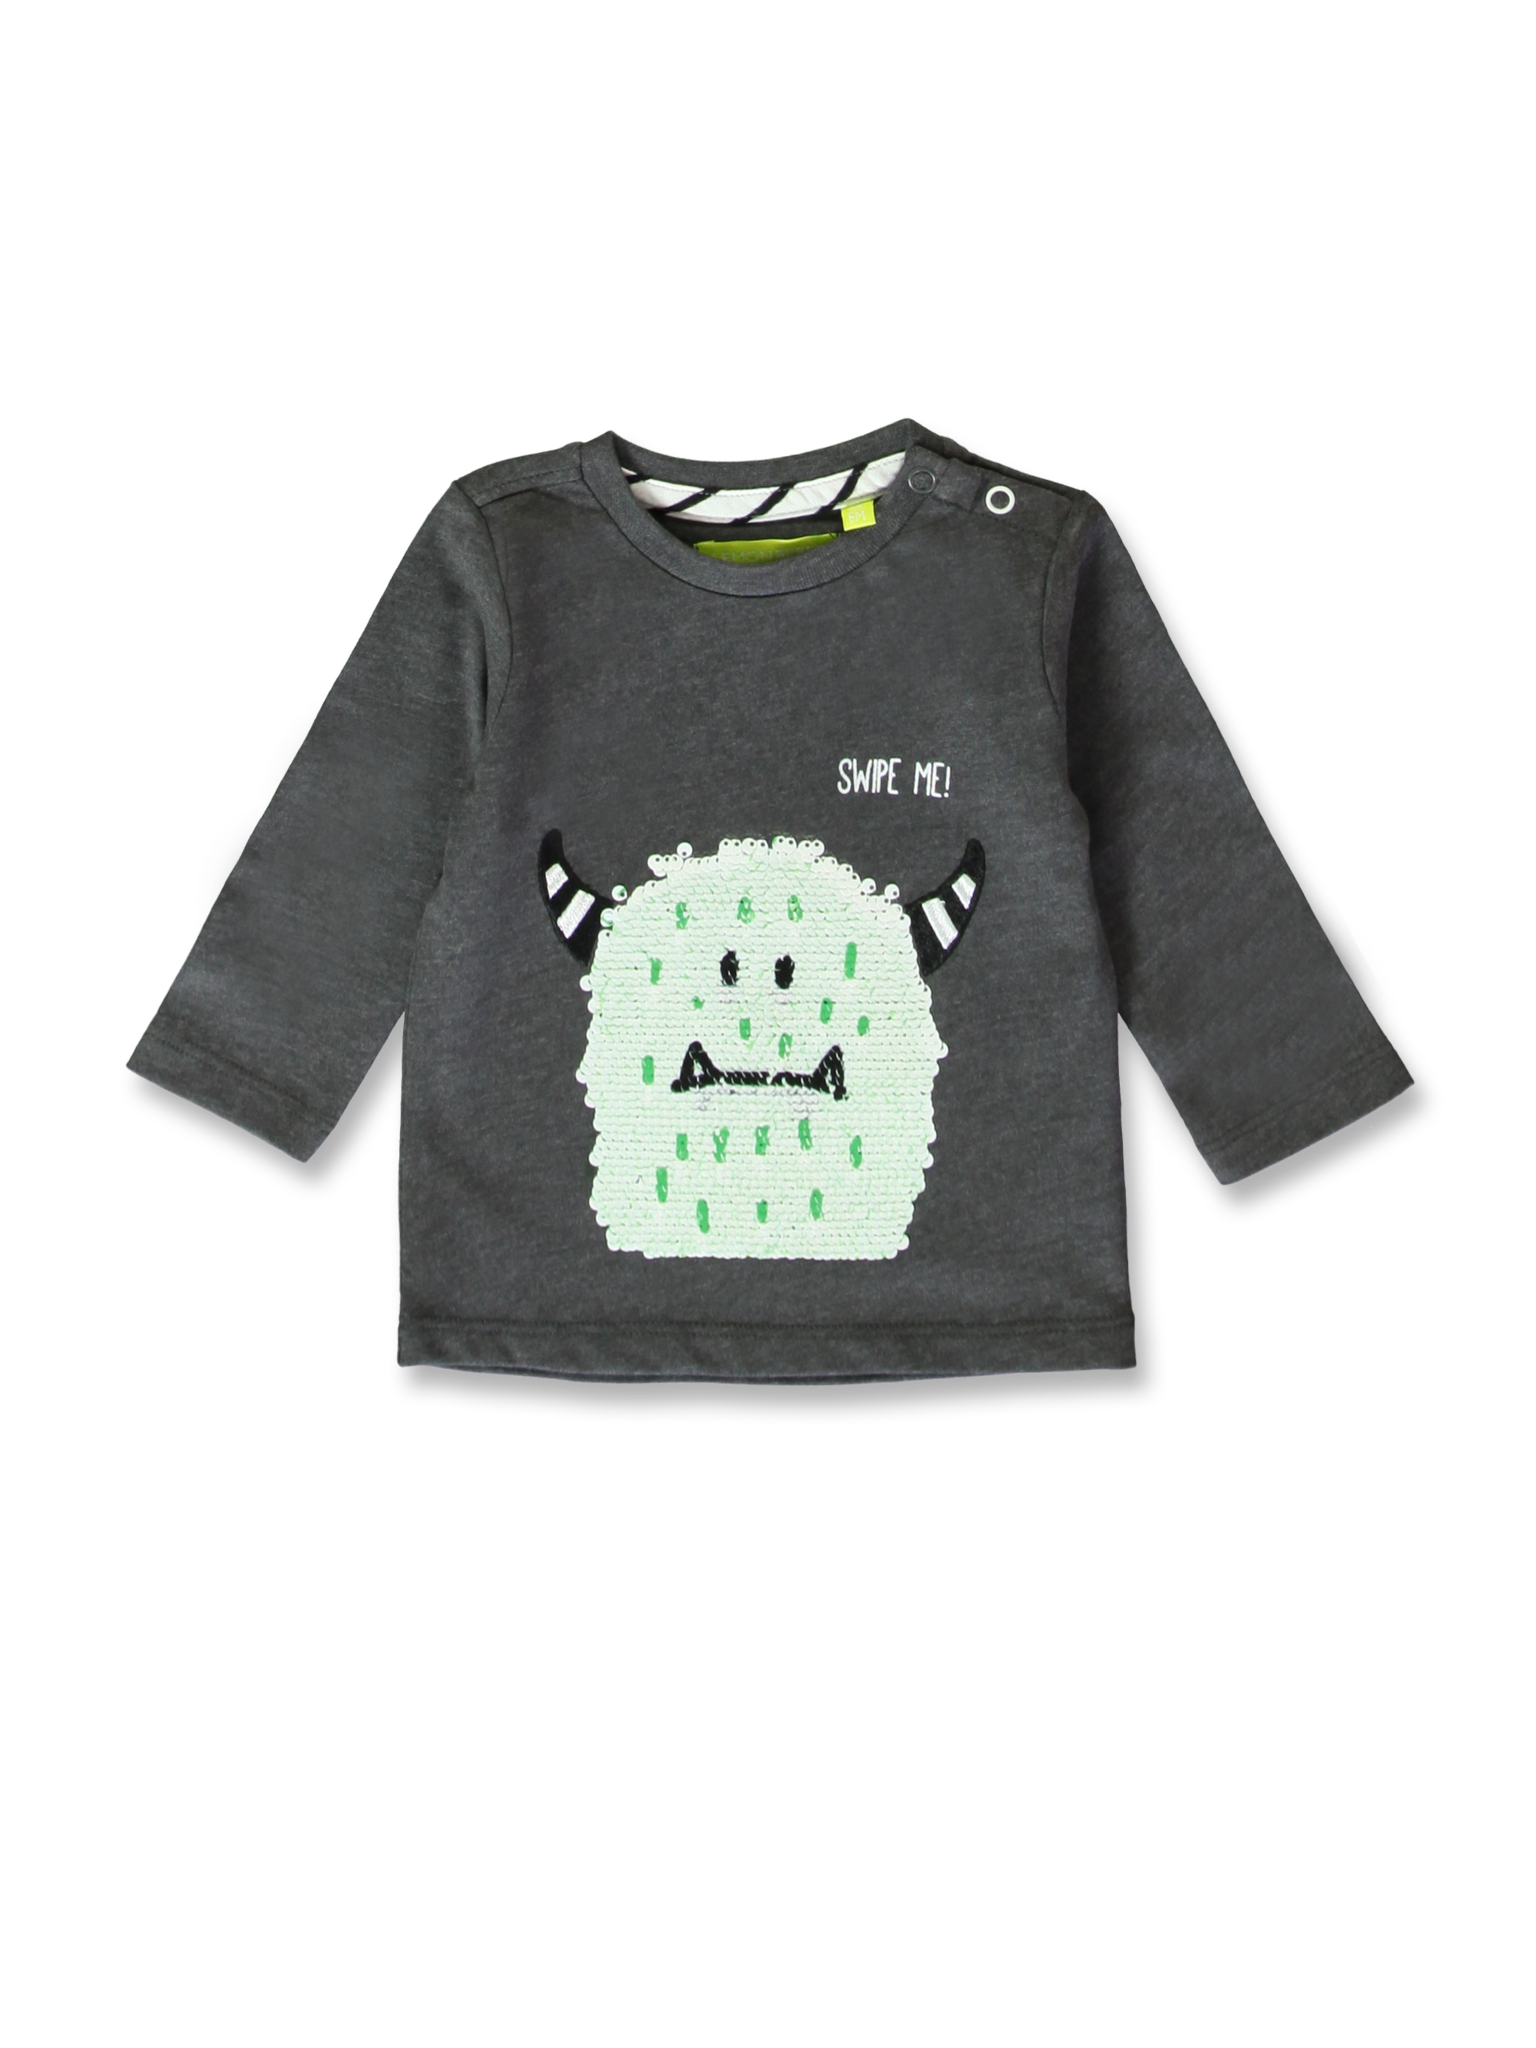 All Brands | Winterproducts Baby | T-shirt | 8 pcs/box